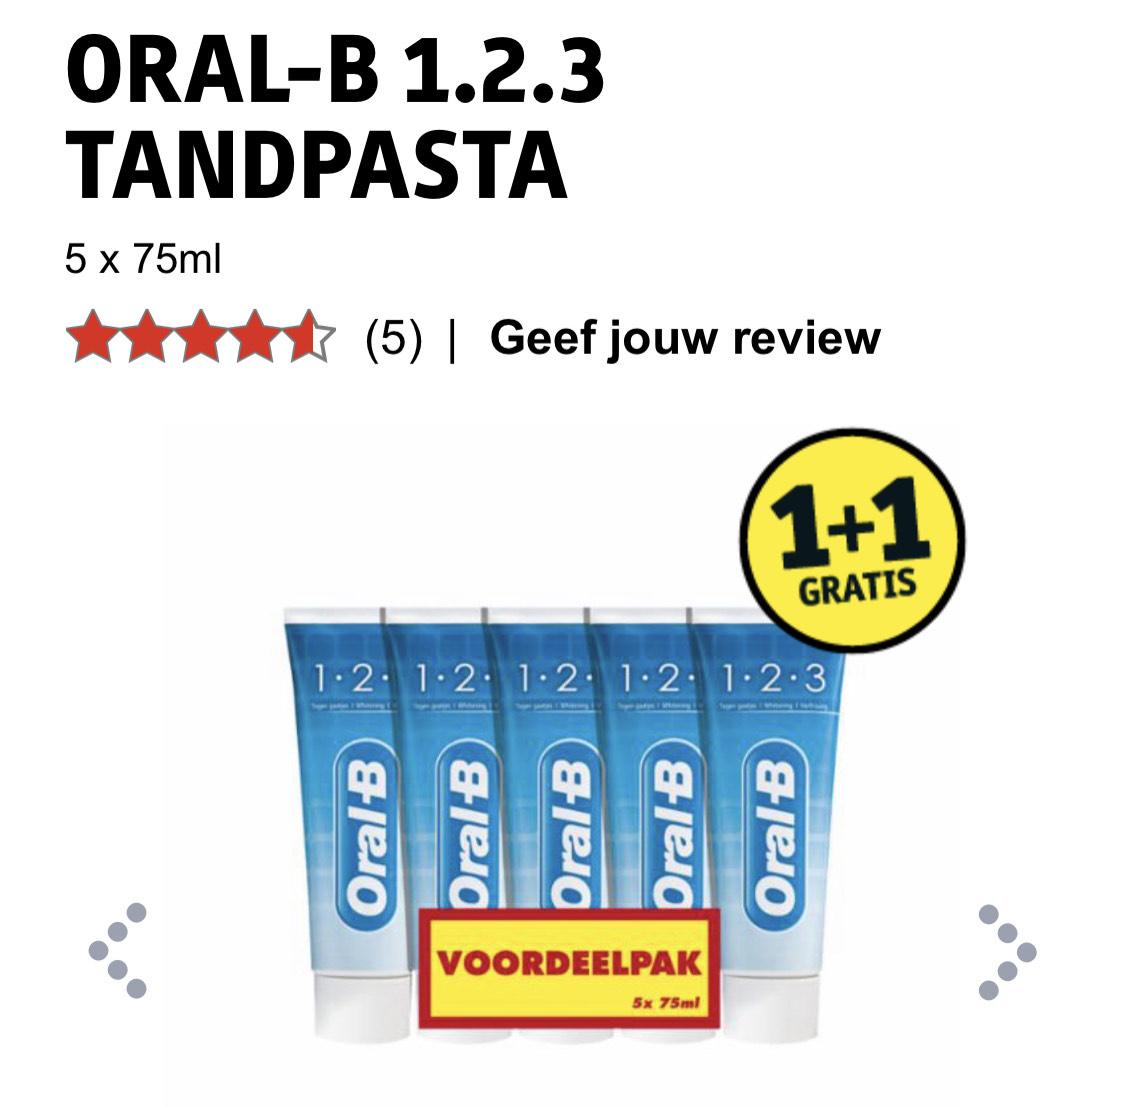 Oral-B 1,2,3 tandpasta (10 tubes voor 5 euro)